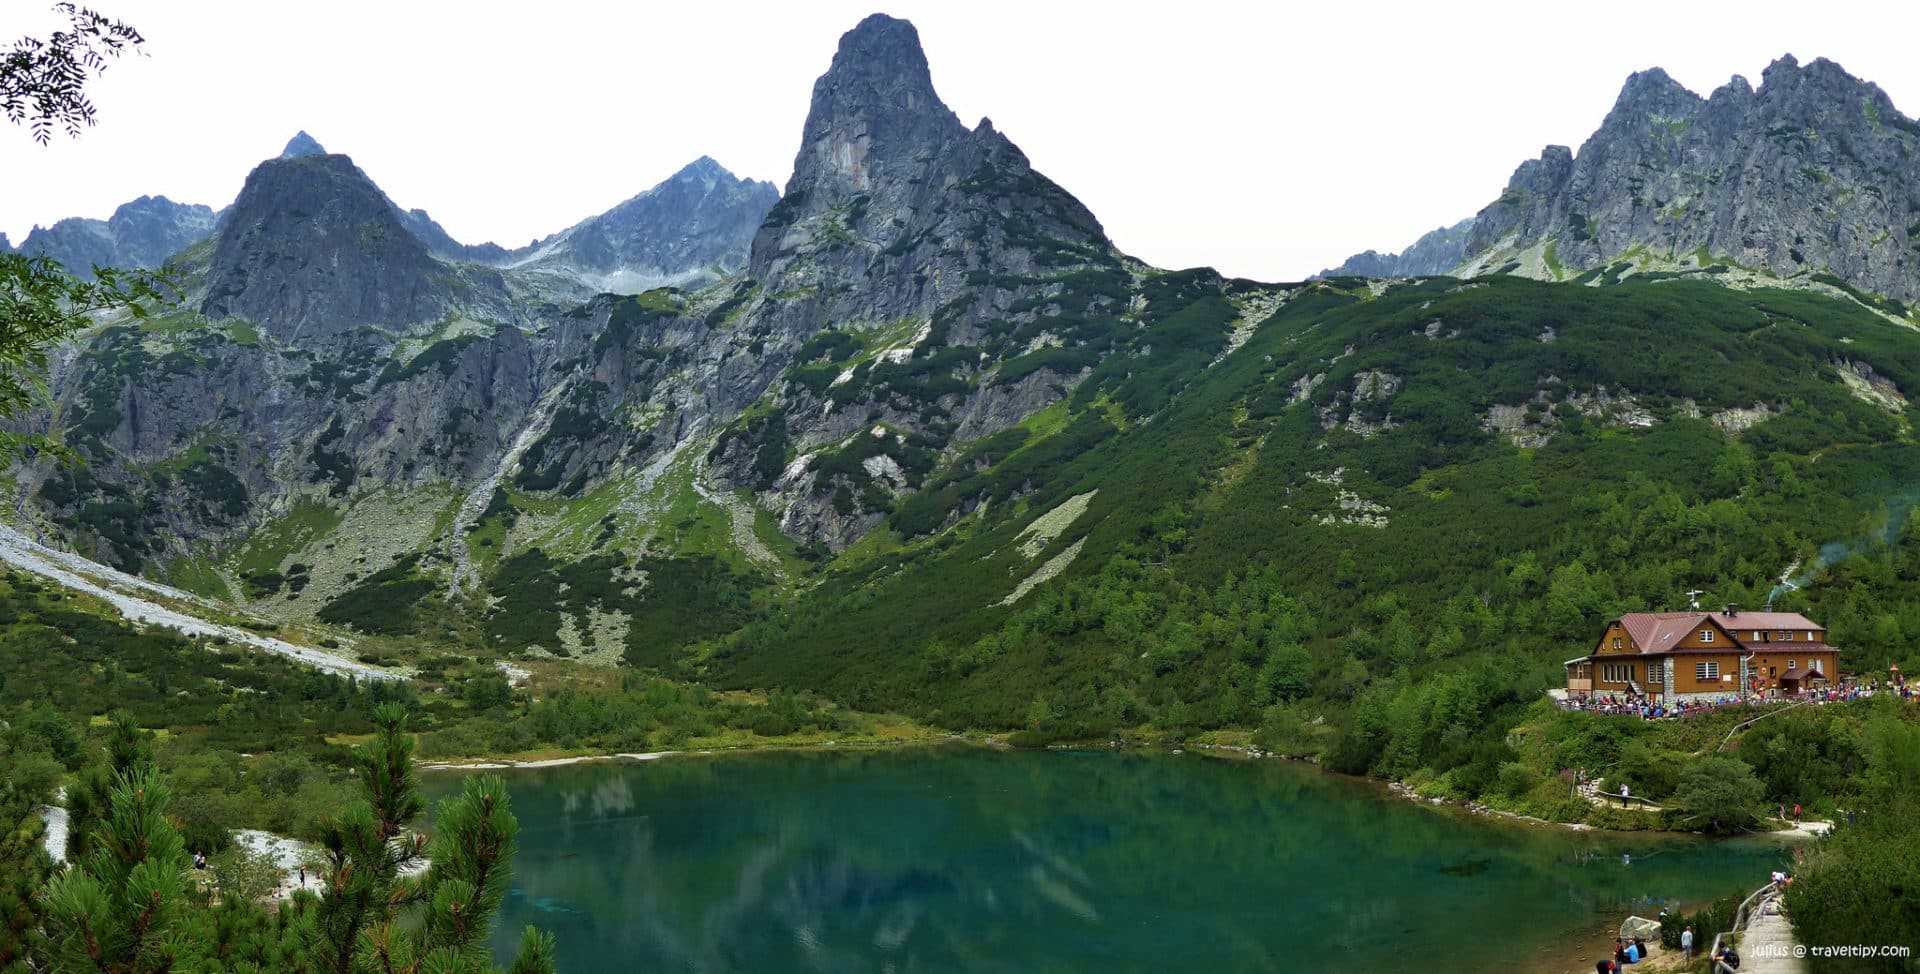 Climbing Baranie Rohy in the Tatras